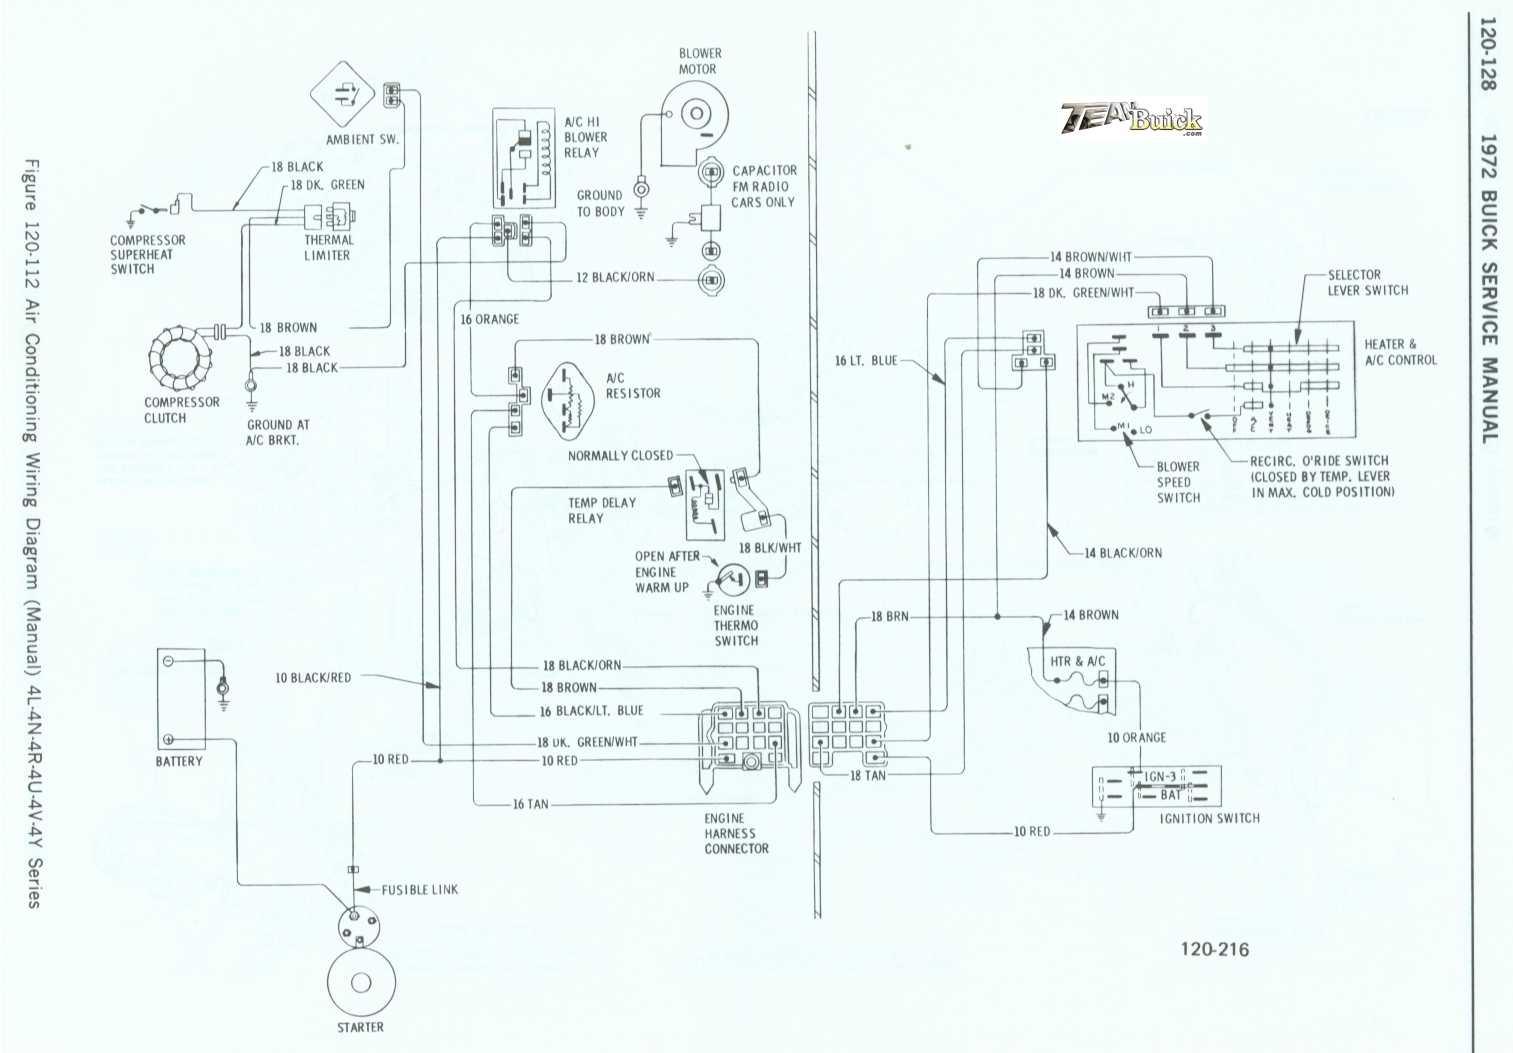 1972 Buick, Air Conditioning Wiring Diagram (Manual) 4L-4N